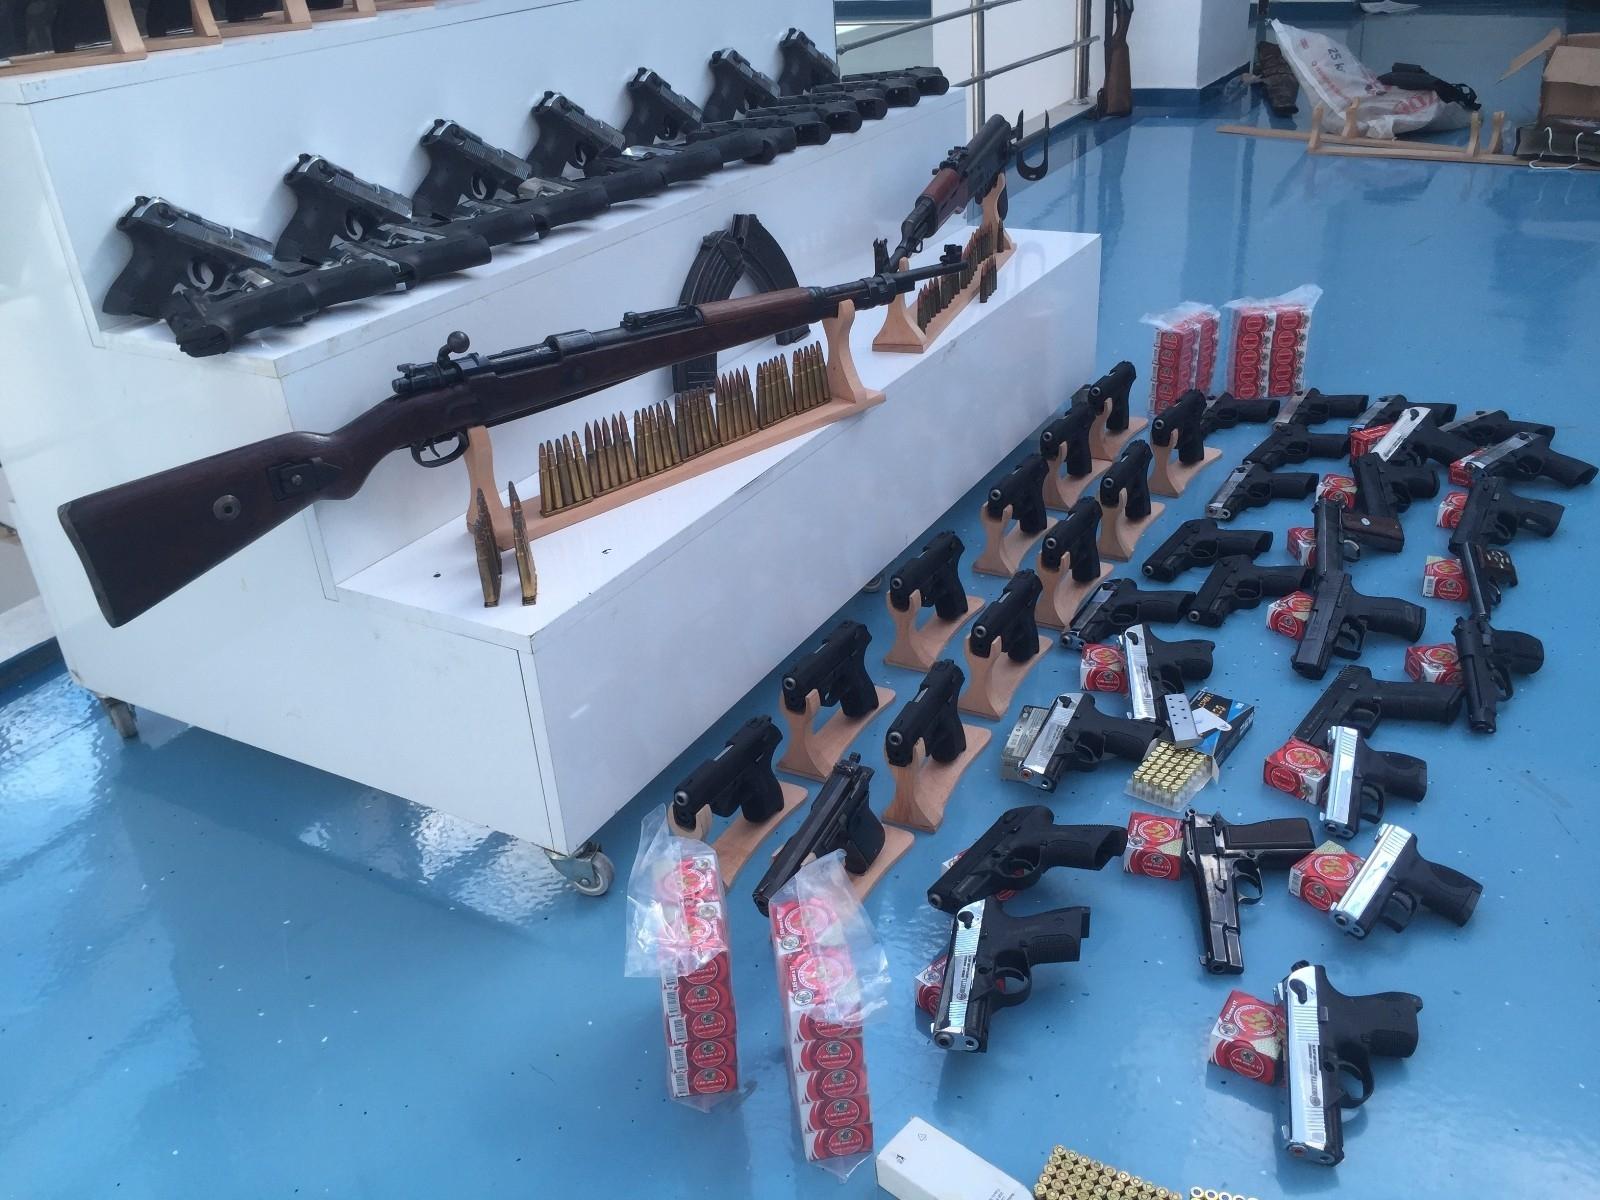 2021/04/silah-kacakciligi-operasyonu-20210427AW30-3.jpg